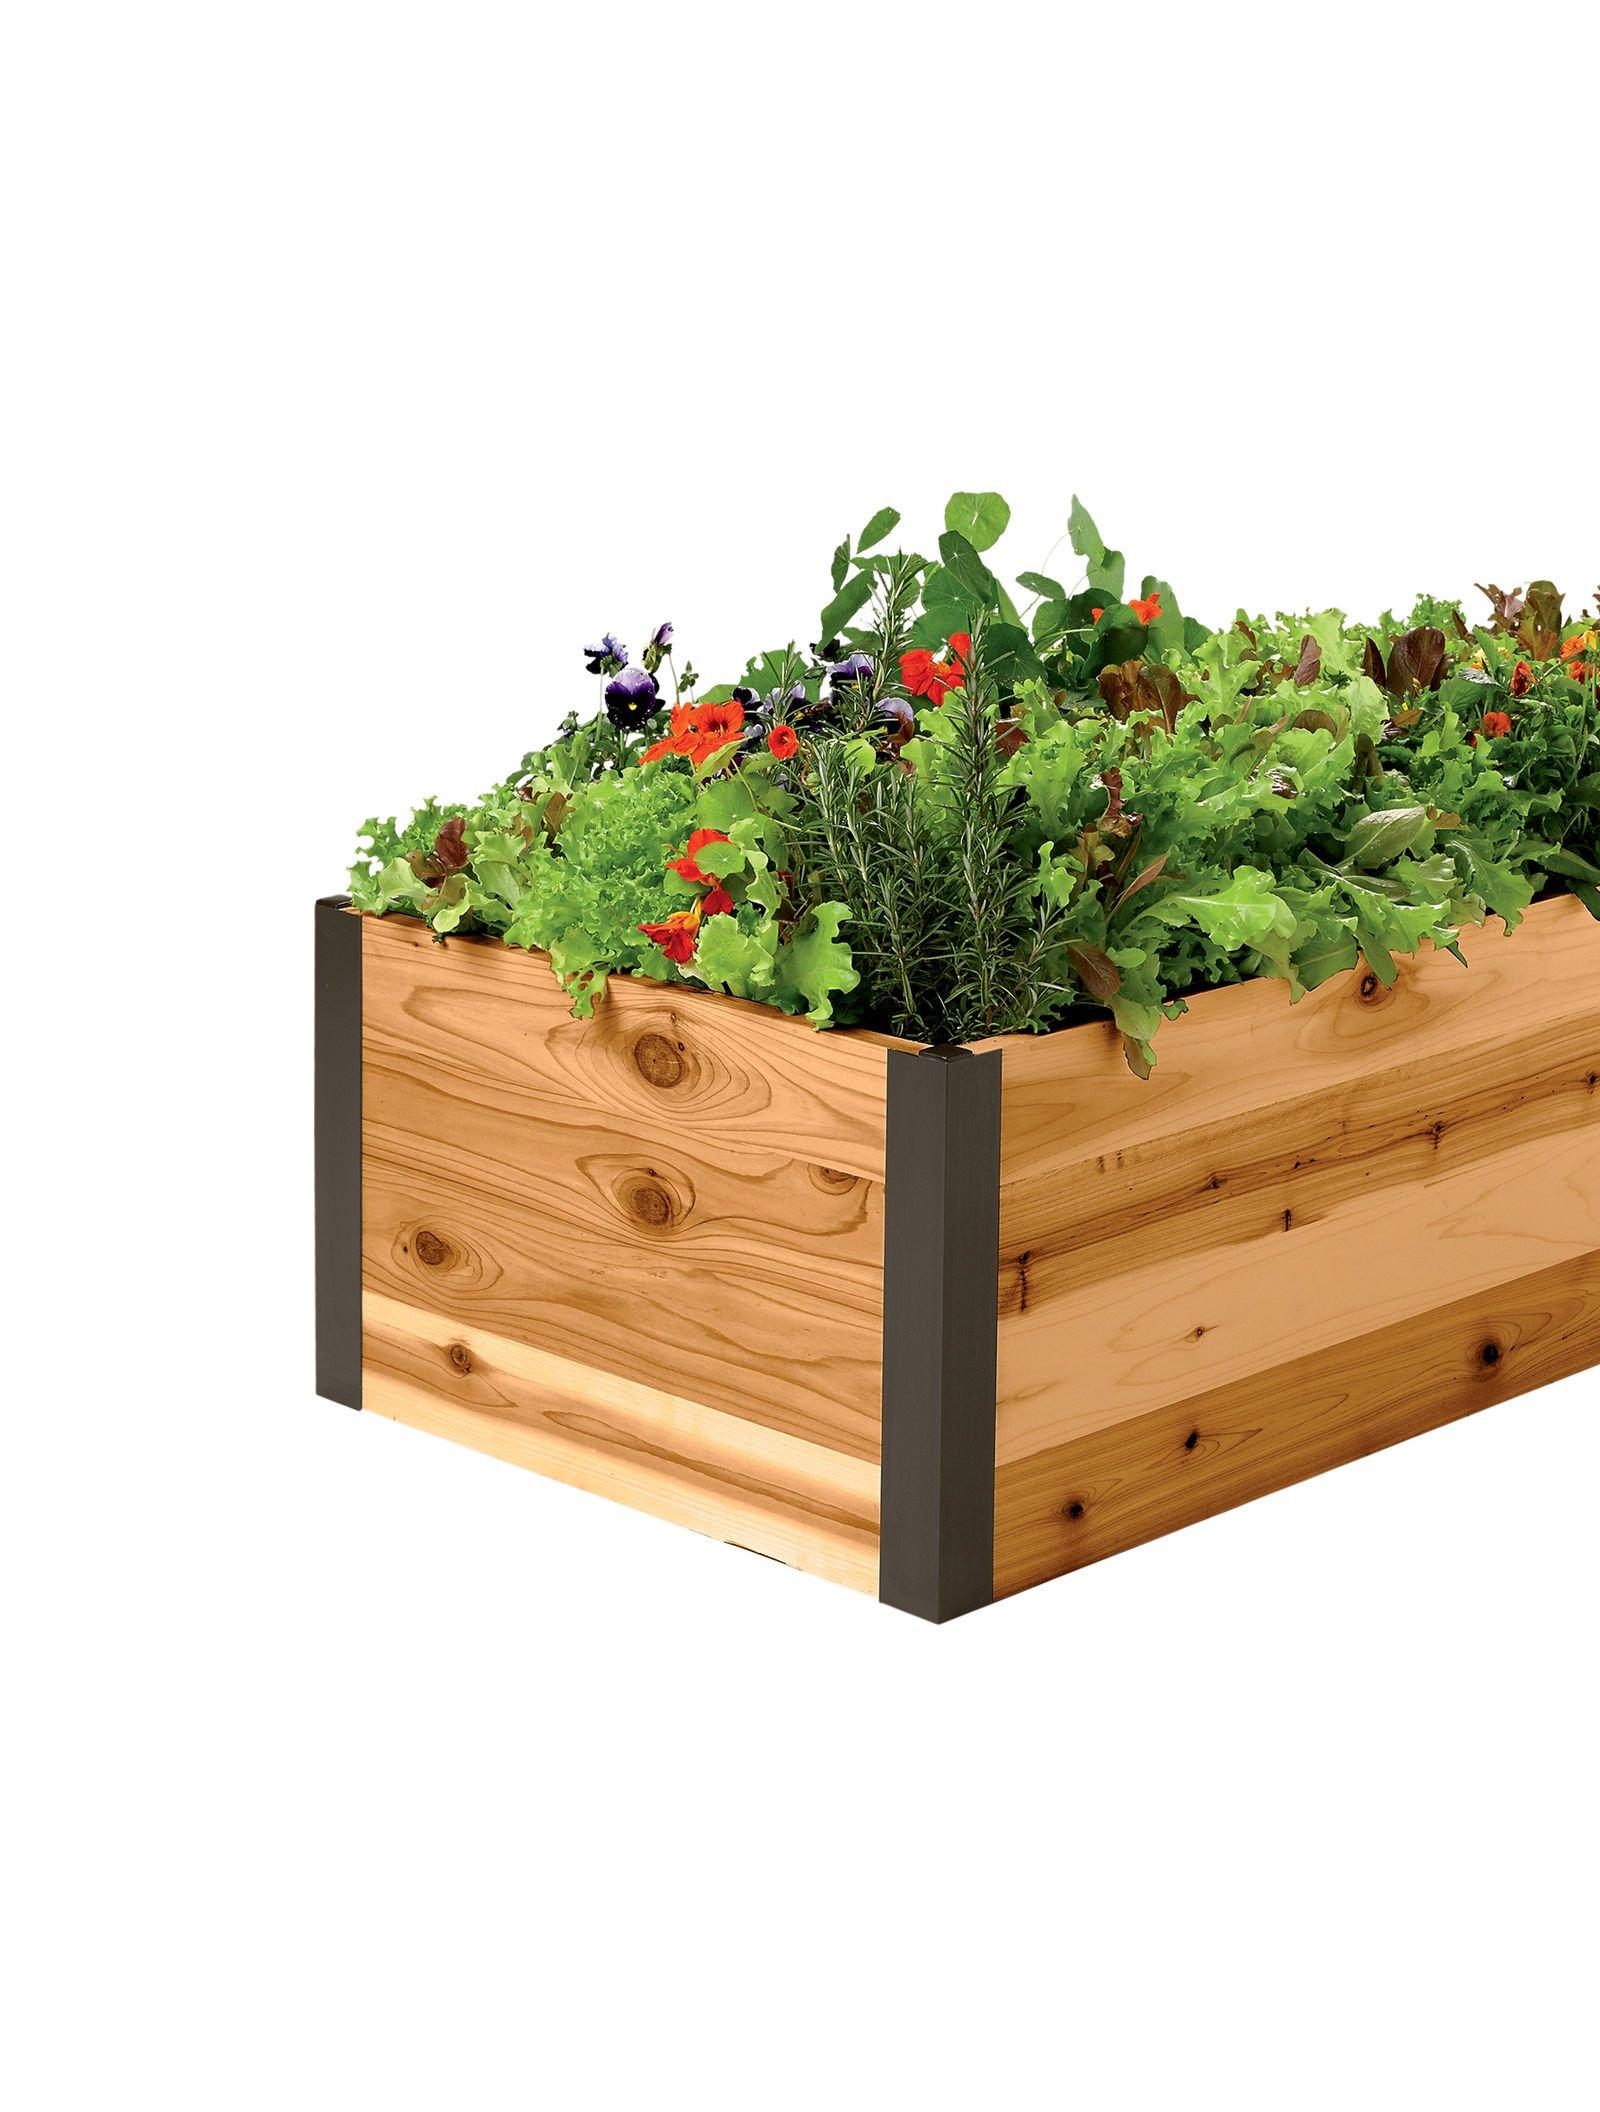 Cedar Raised Garden Bed 2' x 8' x 15'' by Gardener's Supply Company